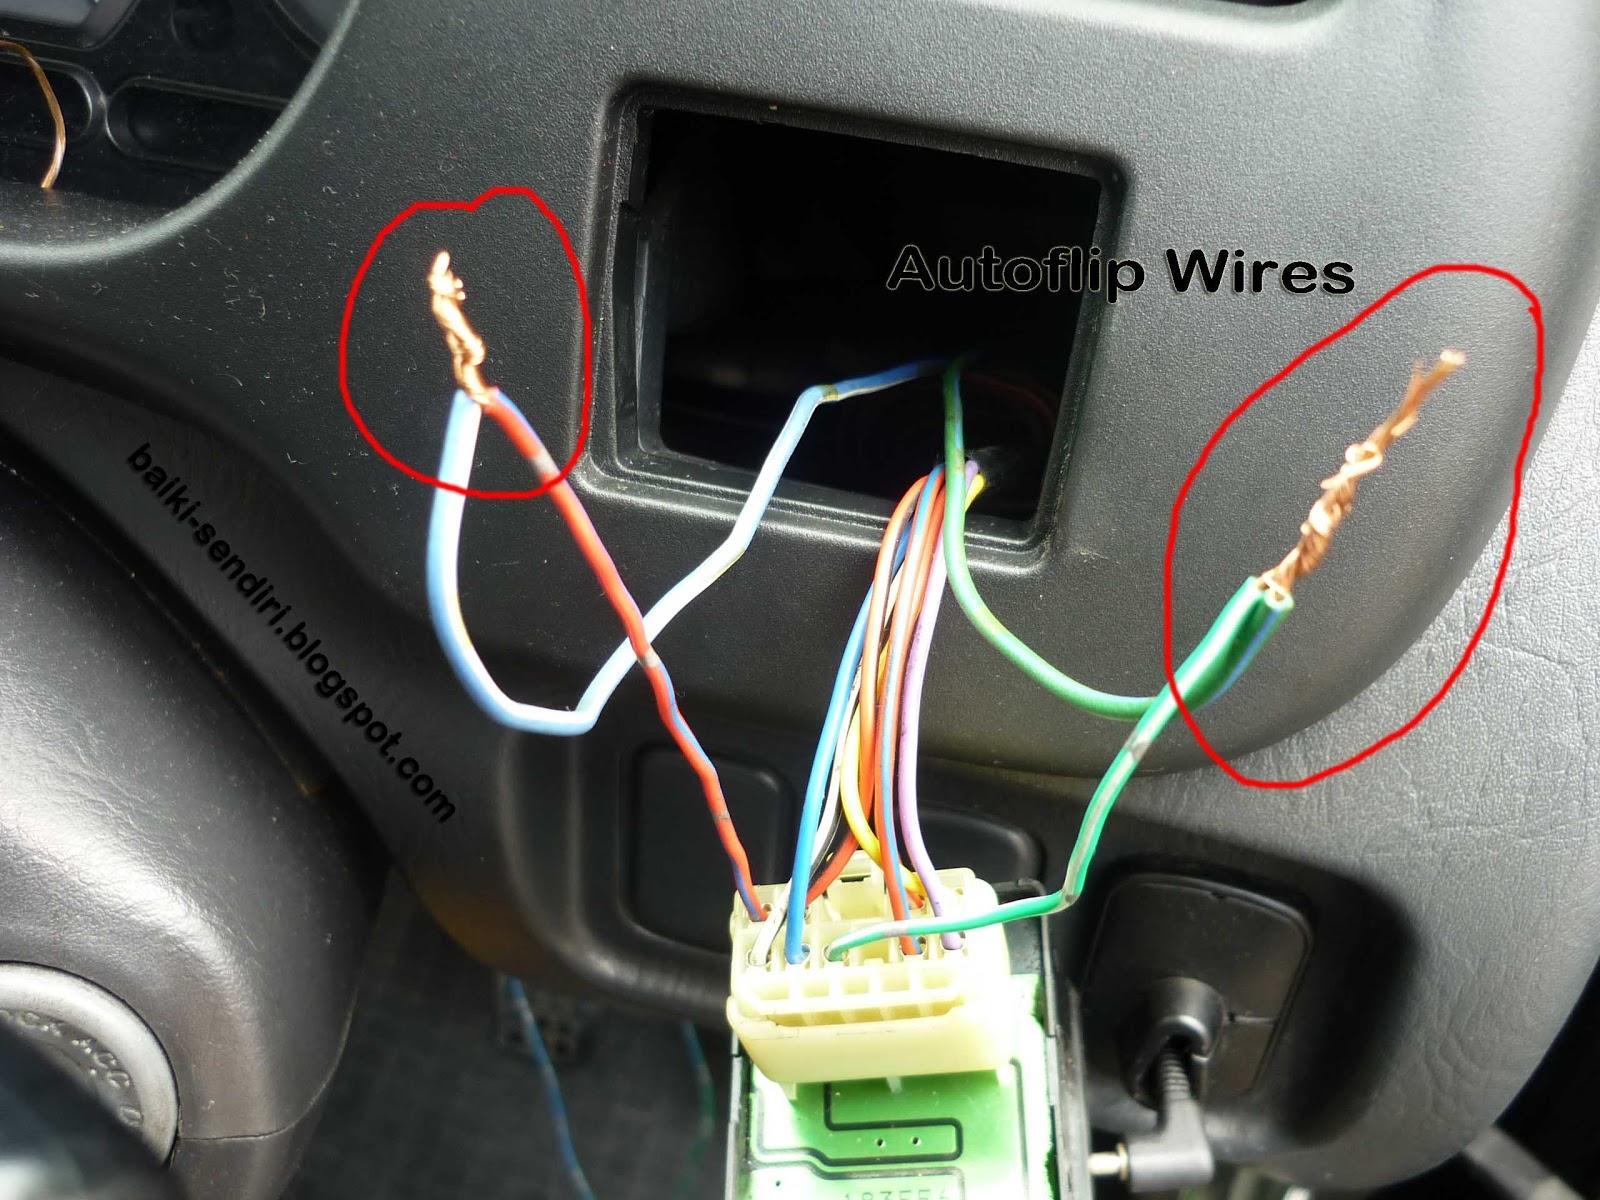 L7 Wiring Diagram 98 Ford F150 Radio Diy Fix On Your Own Daihatsu Perodua Kelisa Autoflip Installation Guide